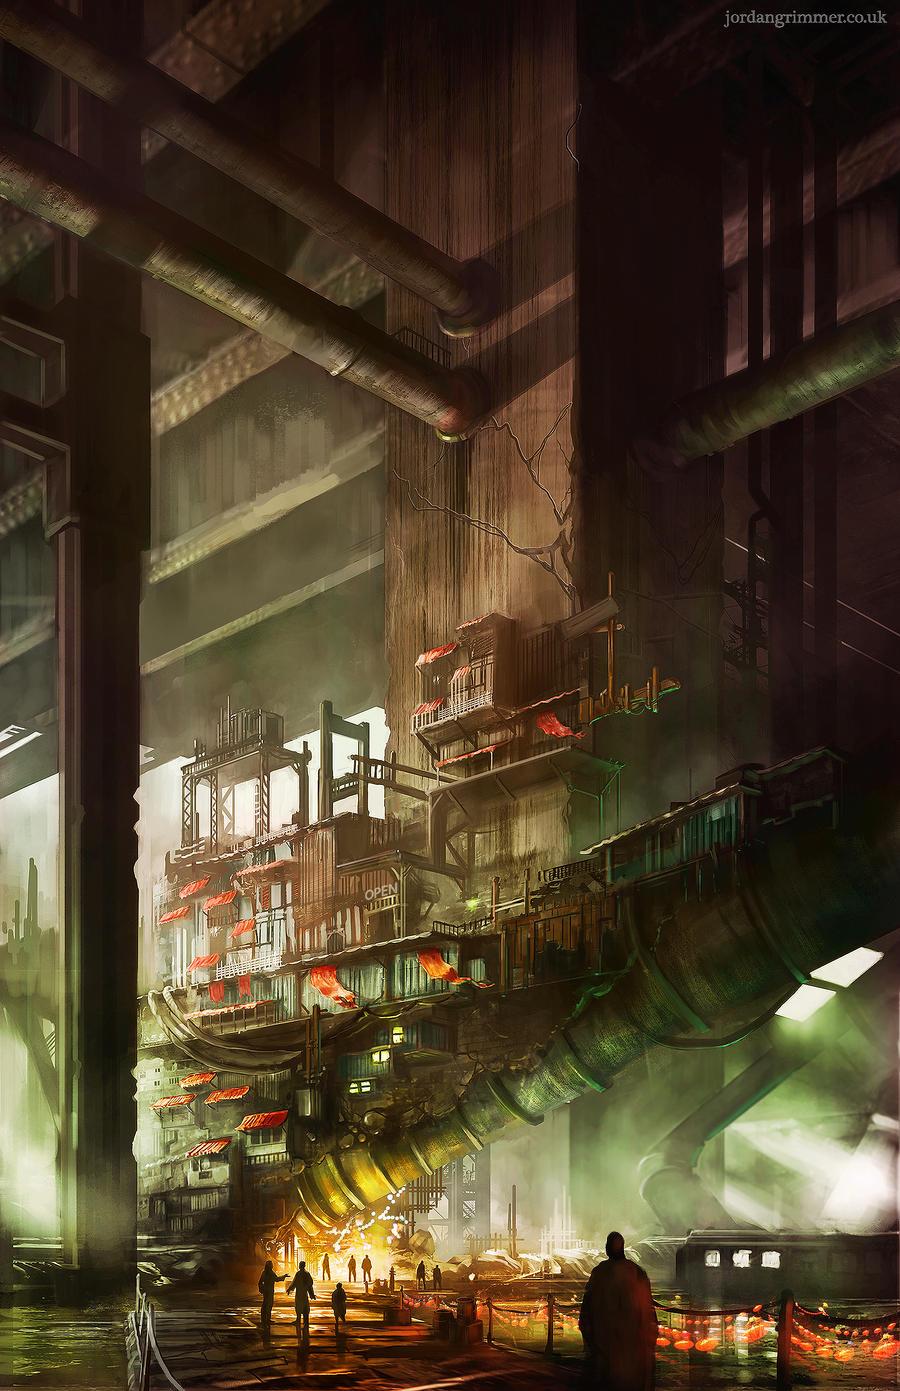 Sector 5 Slums by jordangrimmer